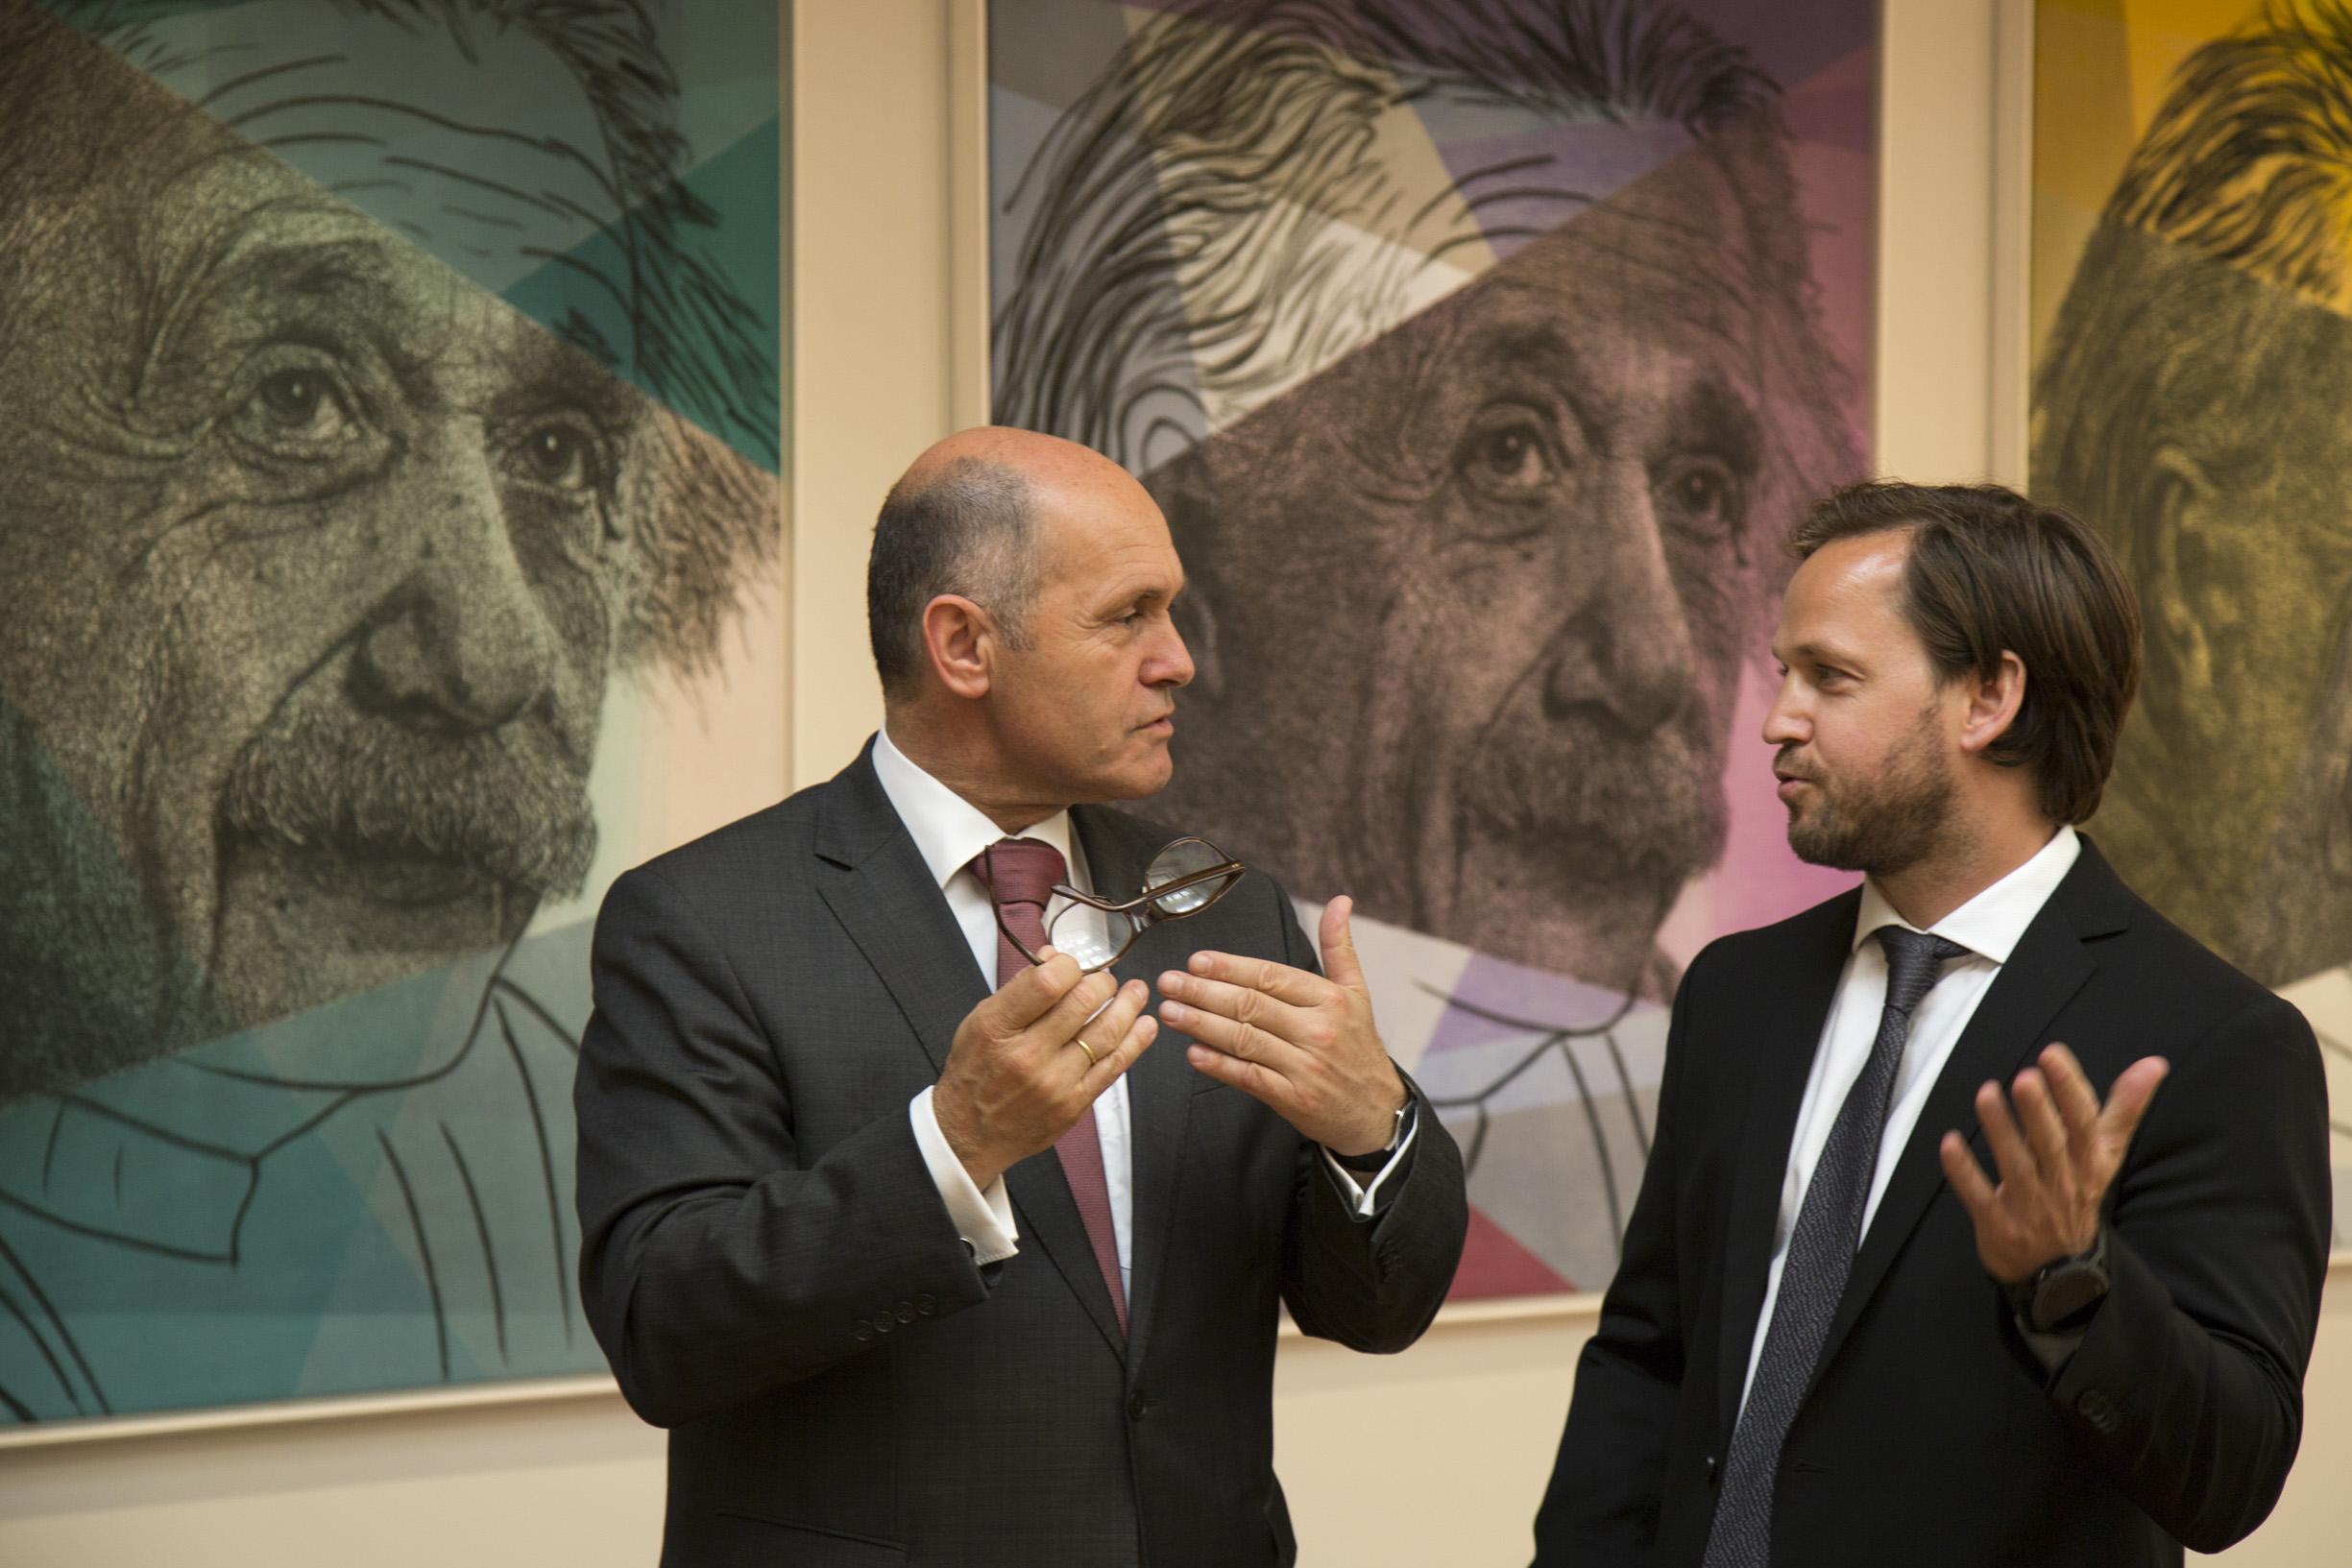 From left: Federal Minister Wolfgang Sobotka, Christoph Palaschke.  Photo: BMI/ Jürgen Makowecz